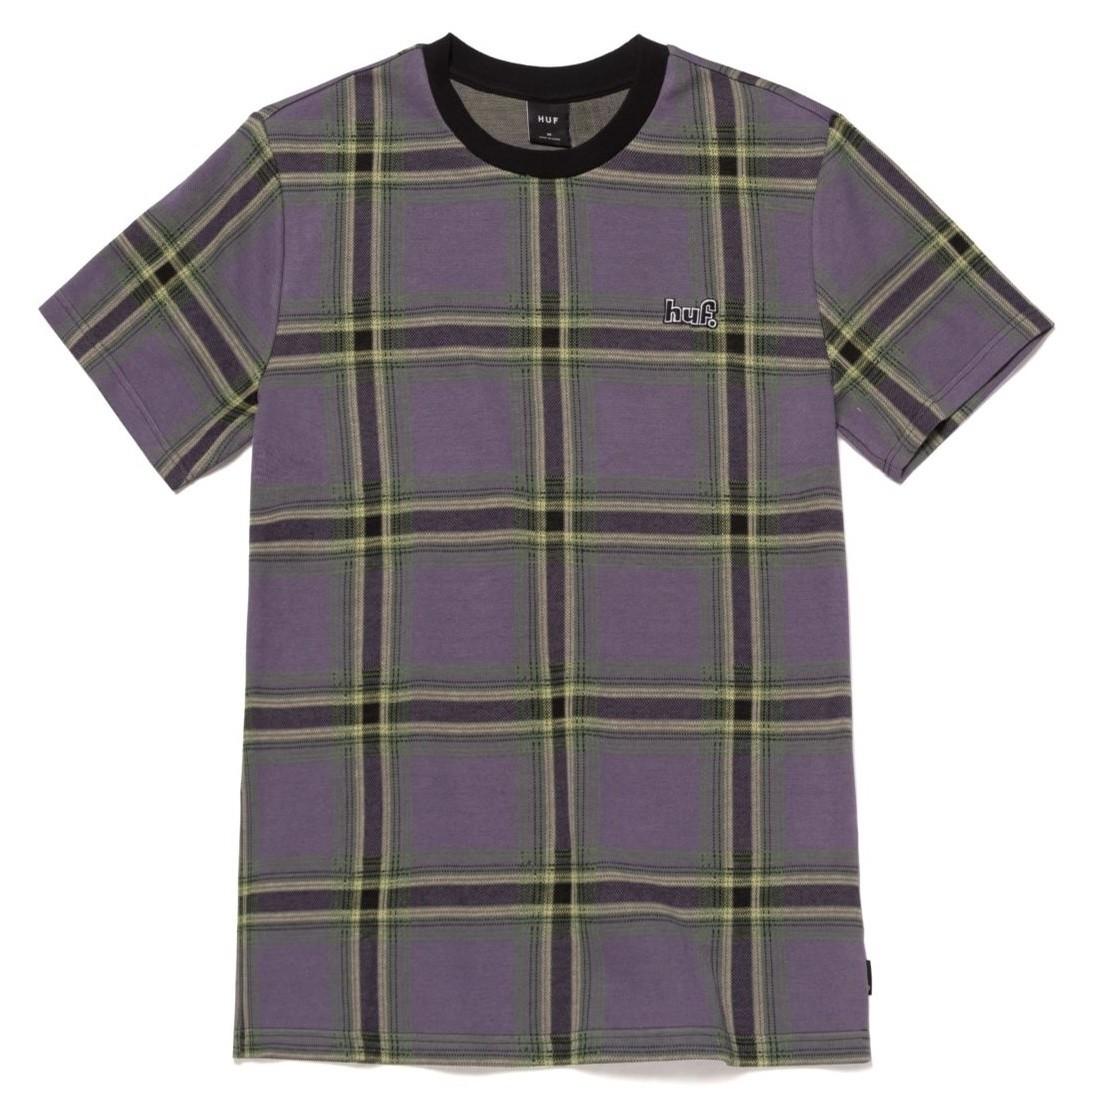 Borland S/S Knit Shirt (Grape)